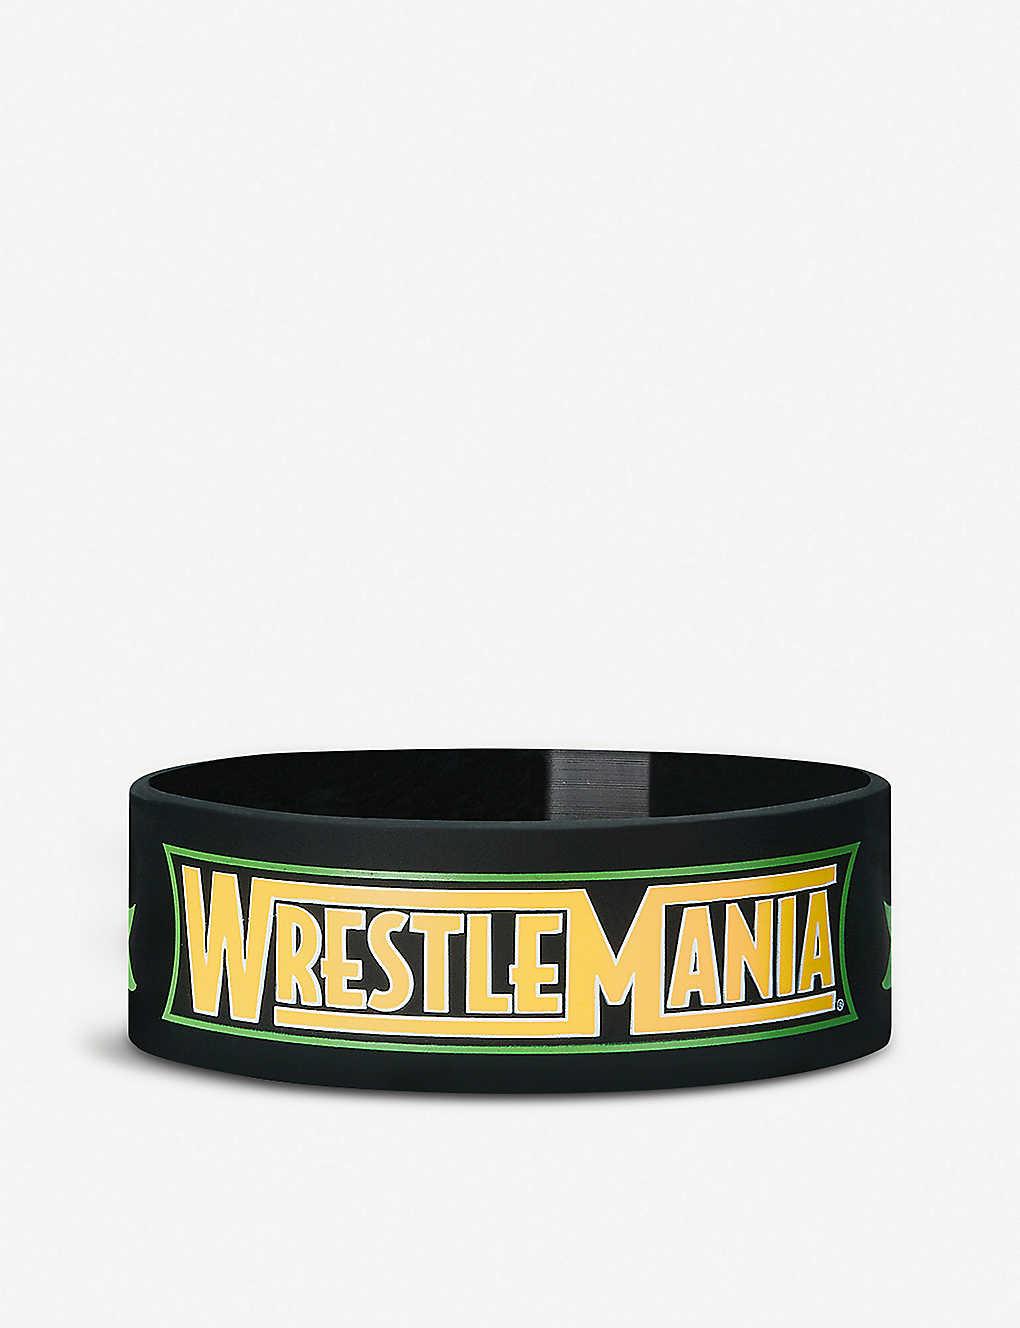 WWE - Wrestlemania 34 silicone bracelet   Selfridges com